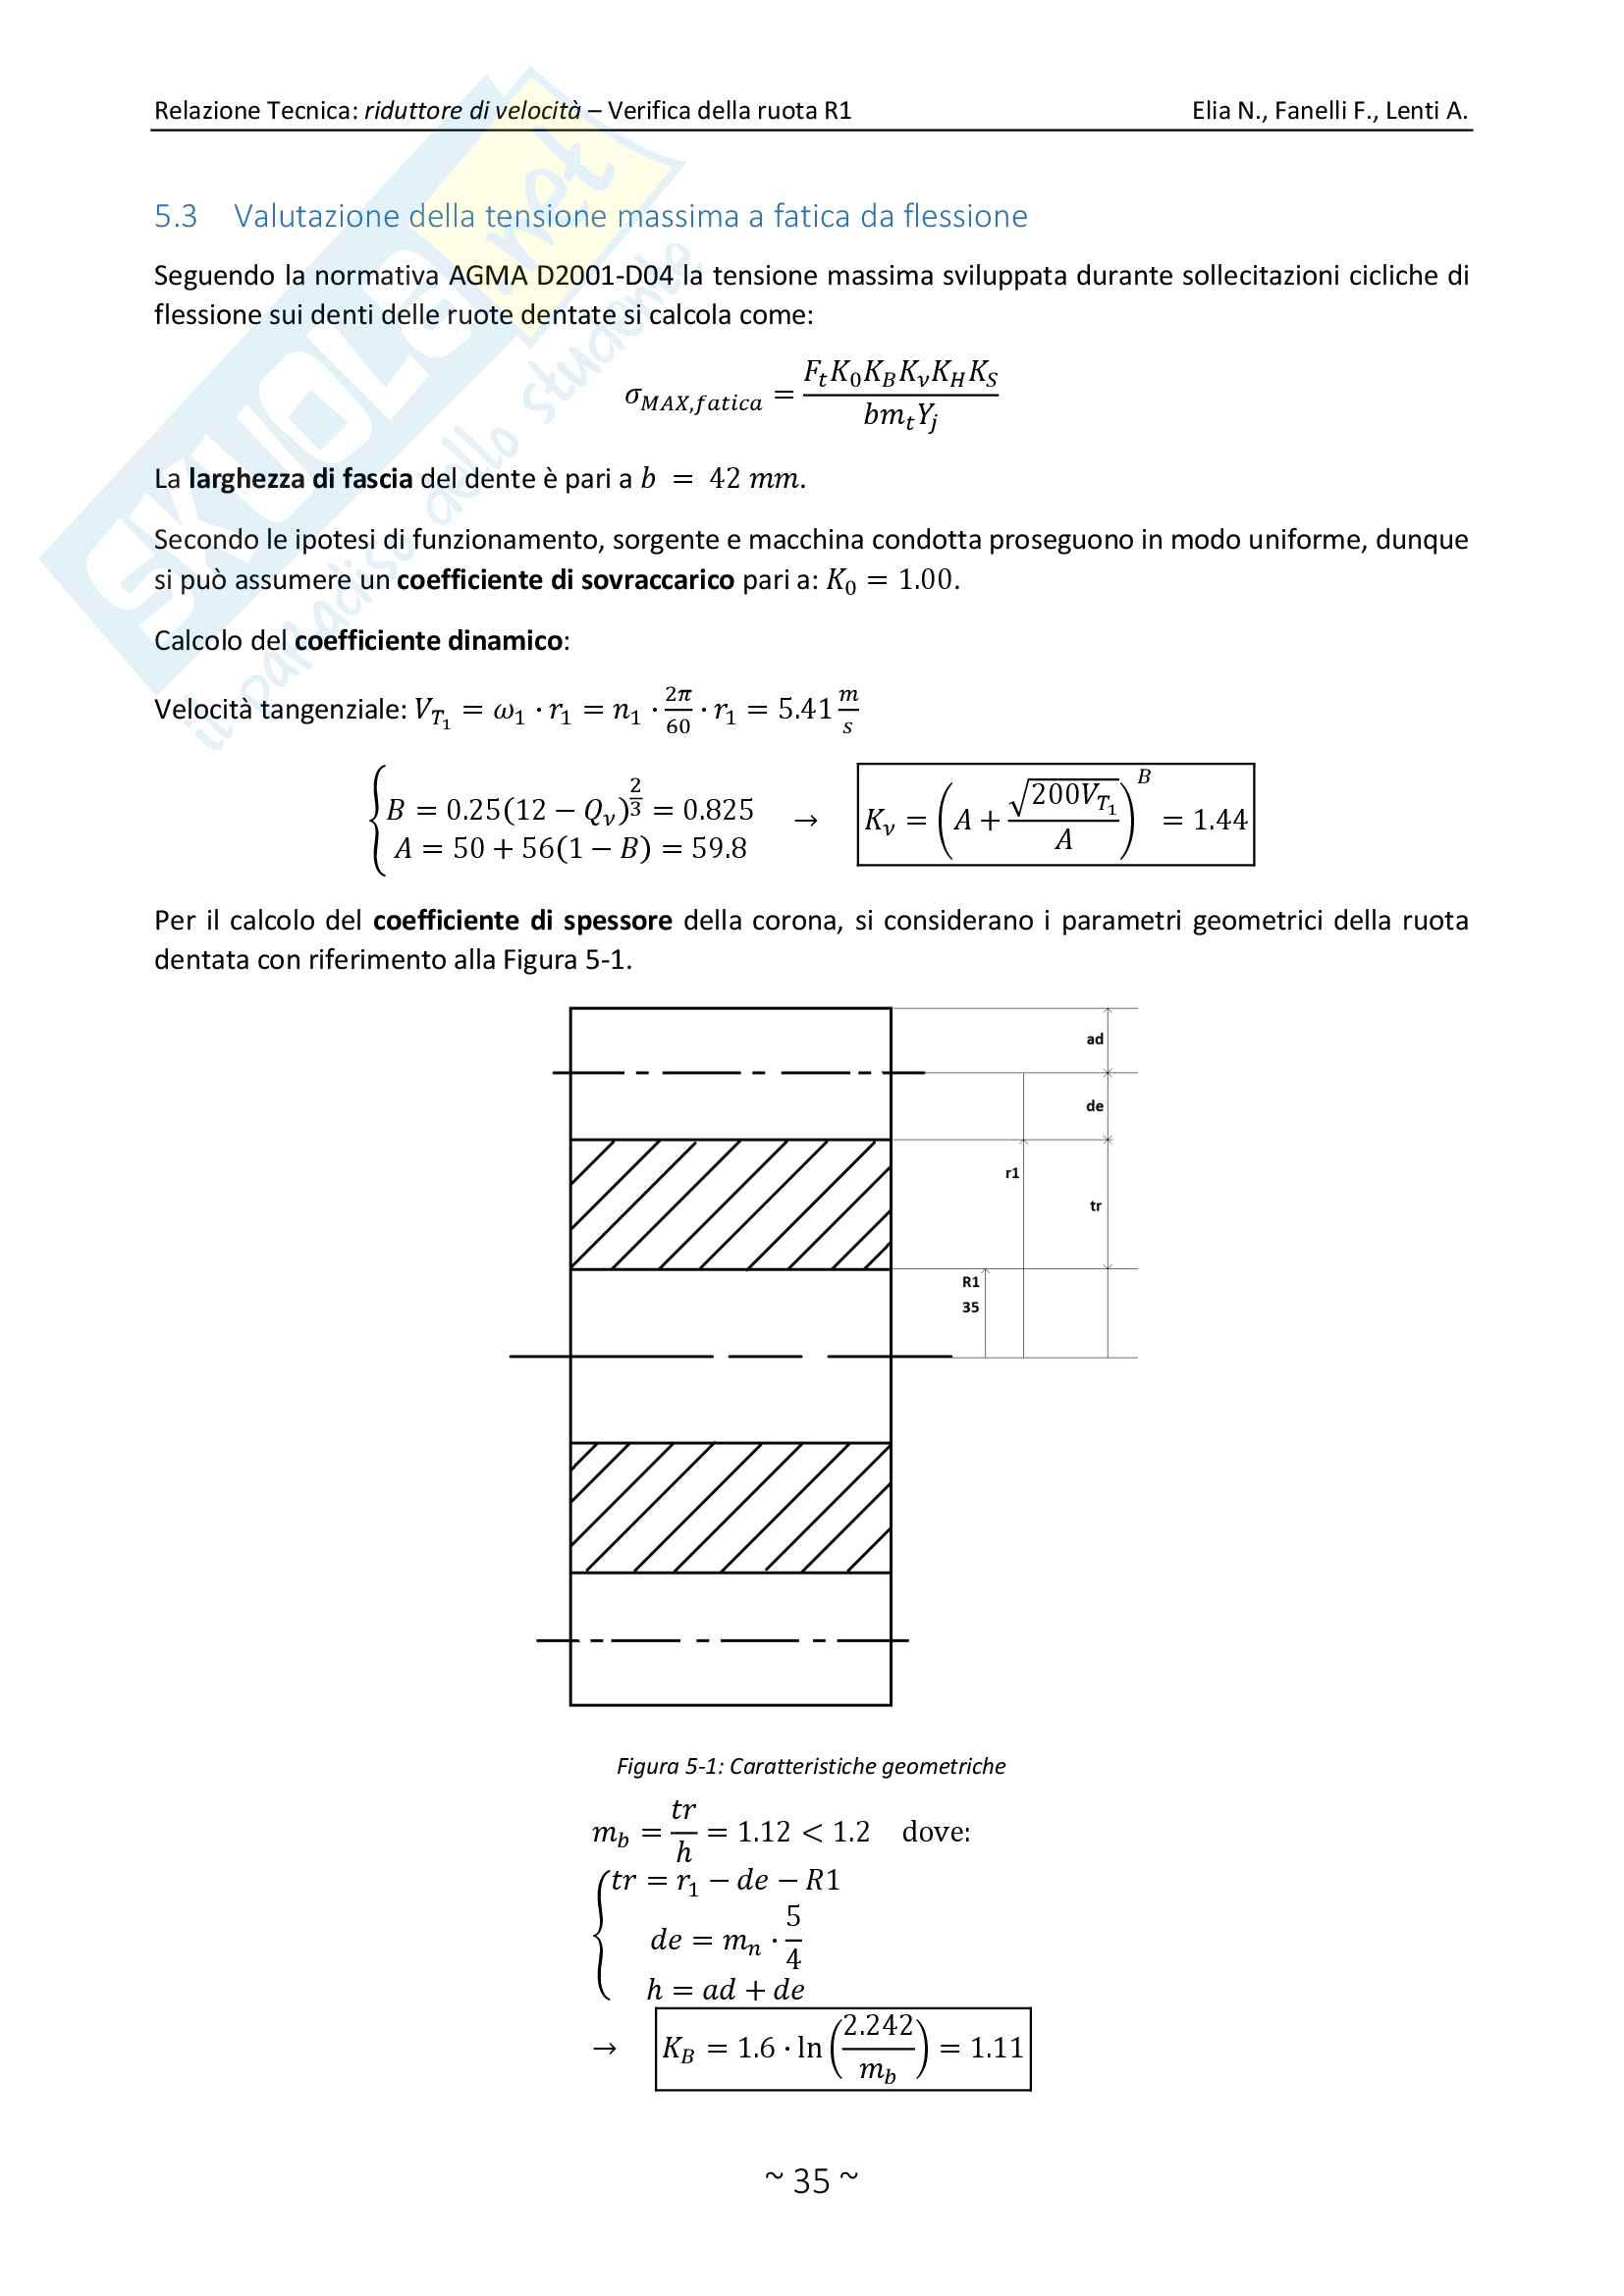 Relazione Tecnica Perfetta, Costruzione di Macchine, Berruti, Brusa Pag. 36